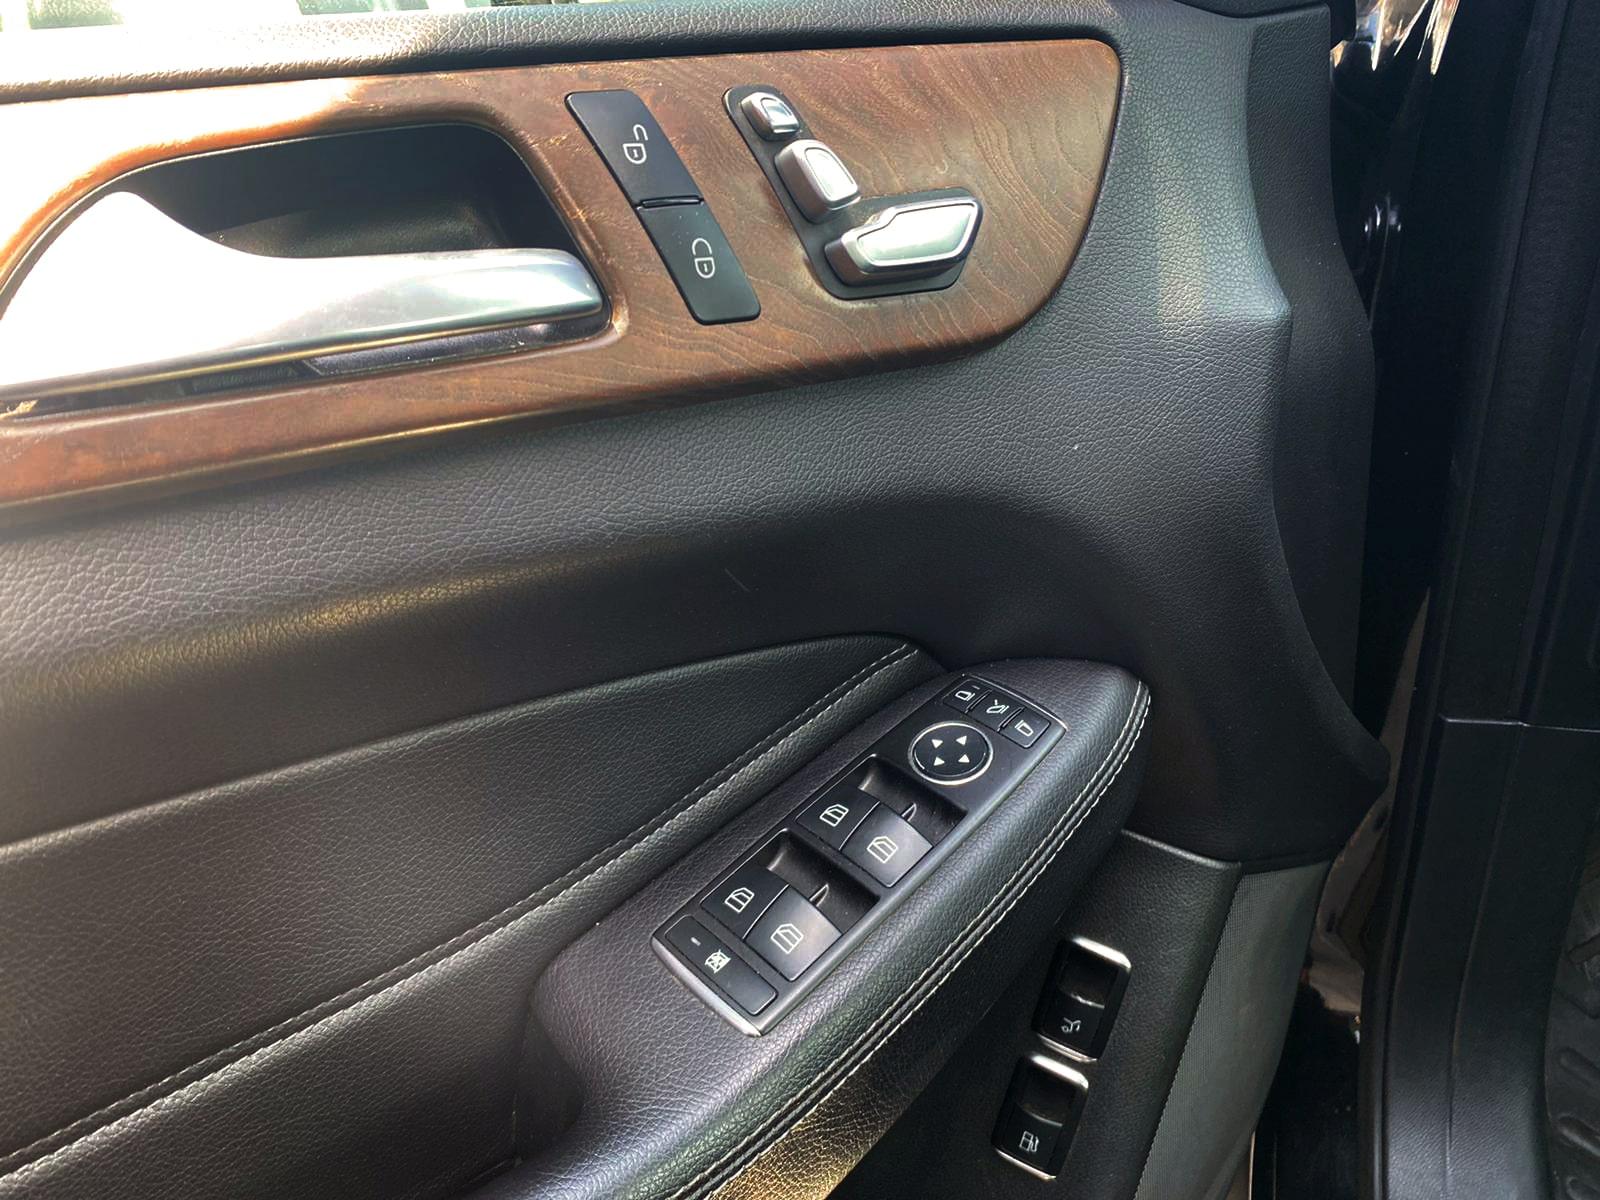 Mercedes-Benz GLE Hybrid